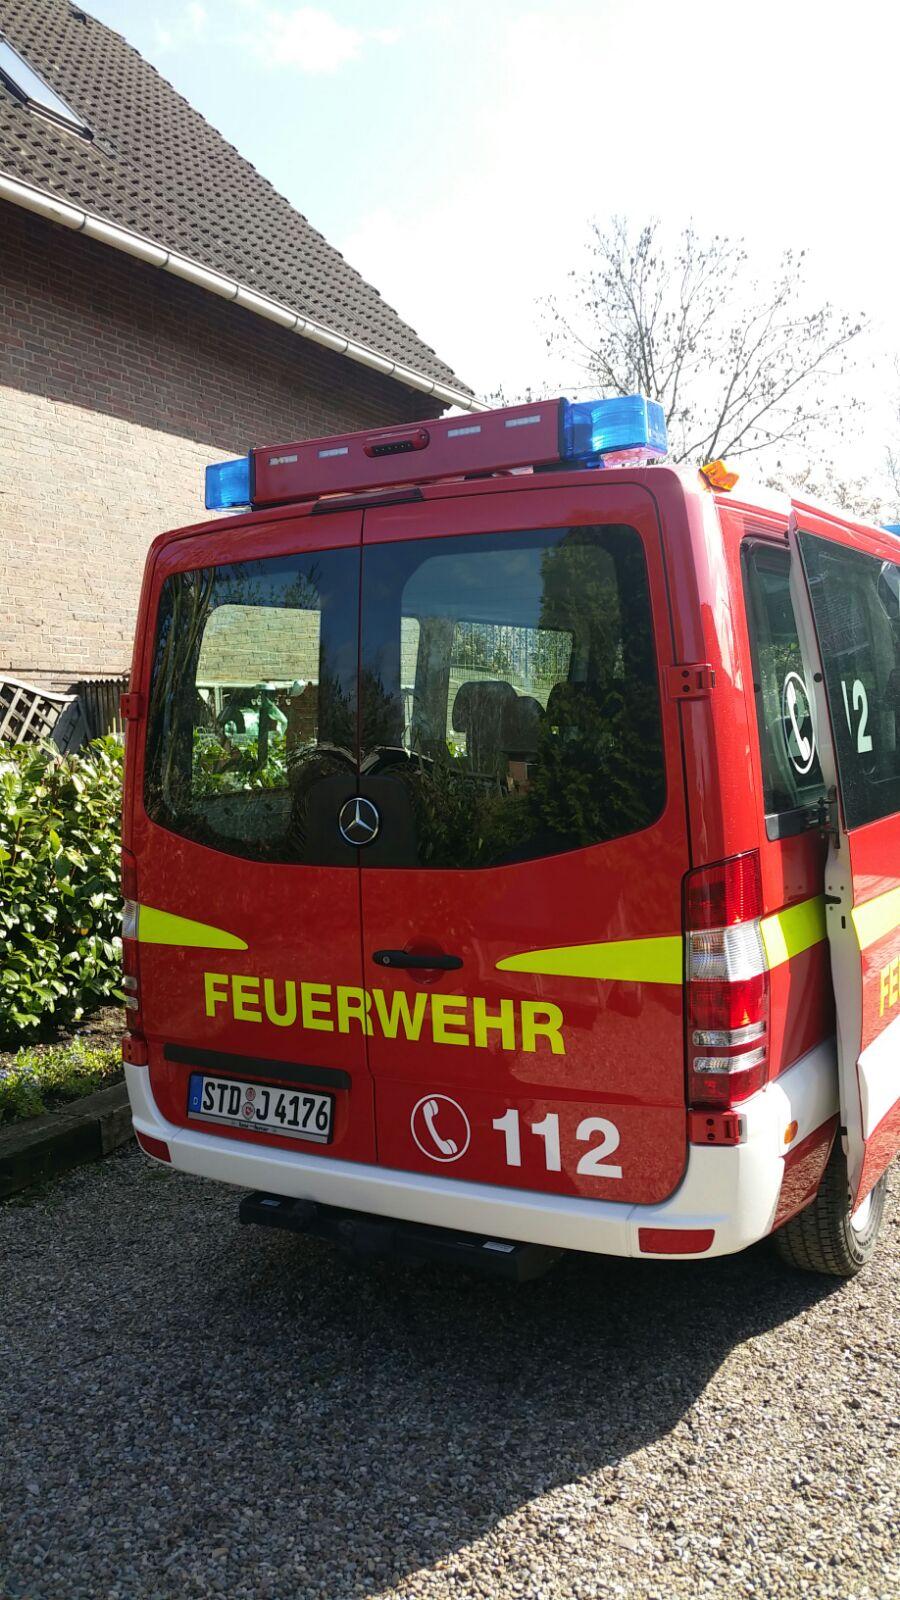 http://feuerwehr-buxtehude.de/media/img/bilder_ow_im/bilder_im_fa/mtf/4176d.jpg